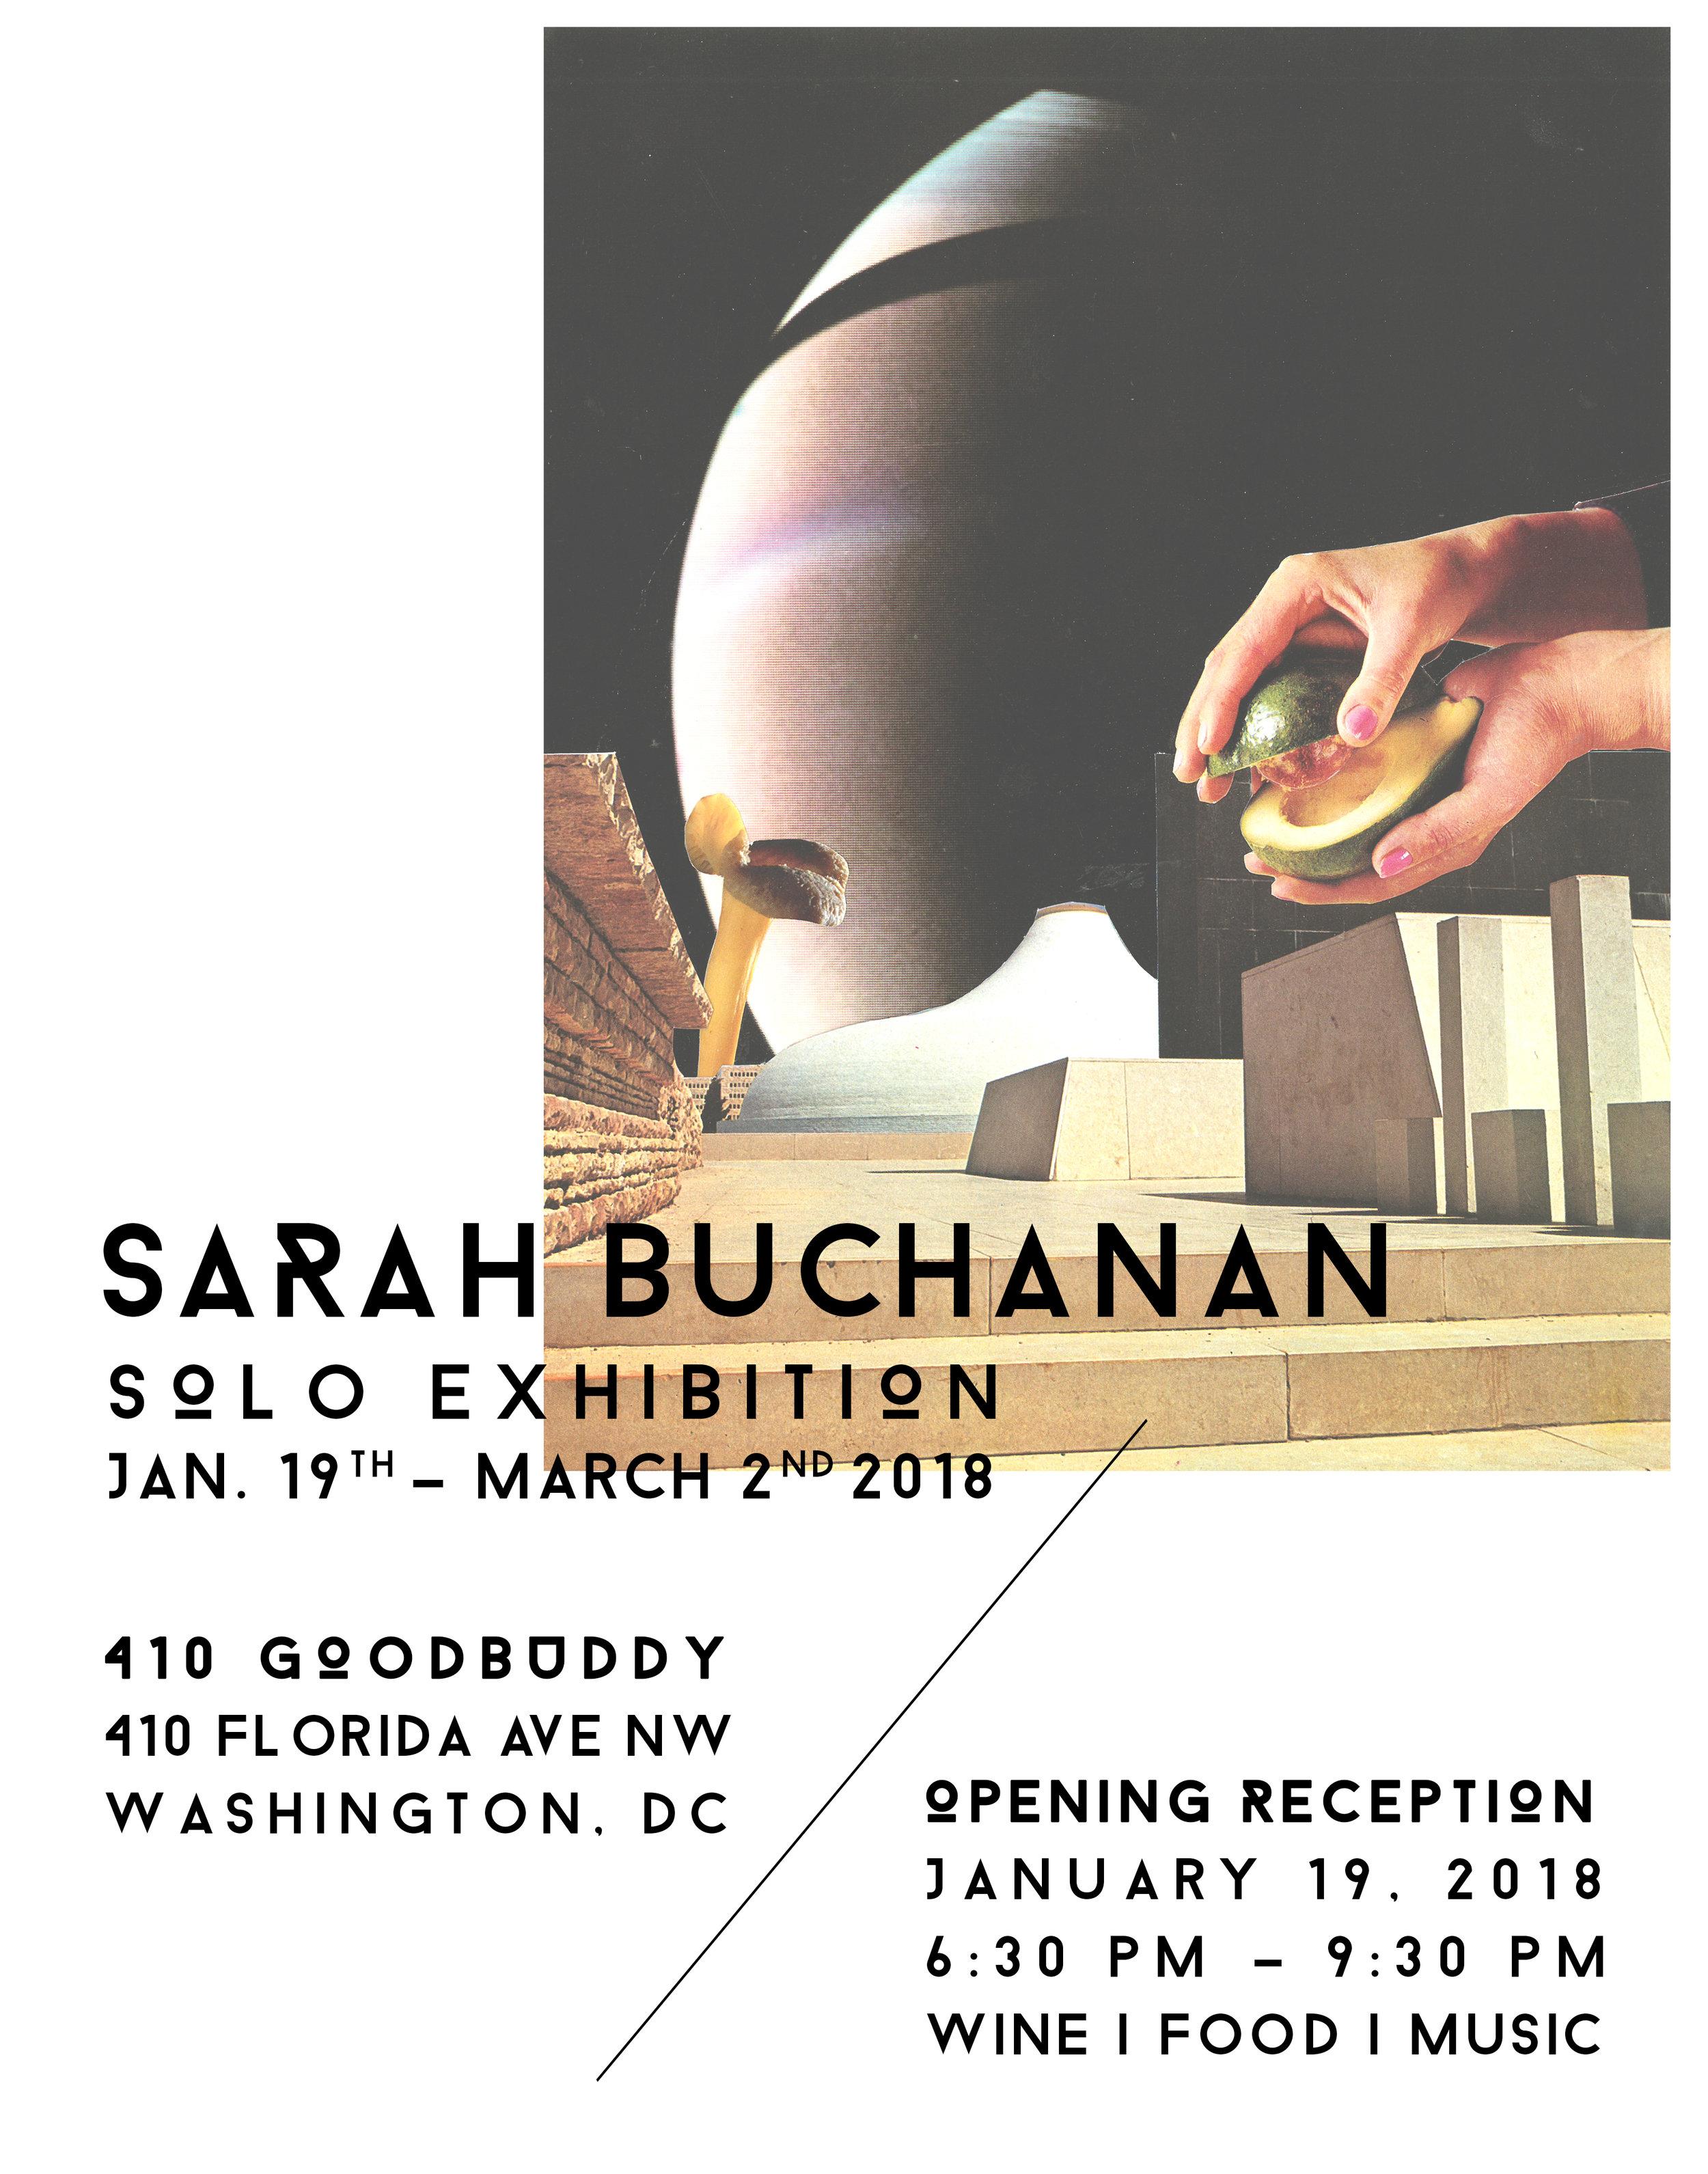 buchanan_exhibition_january.jpg